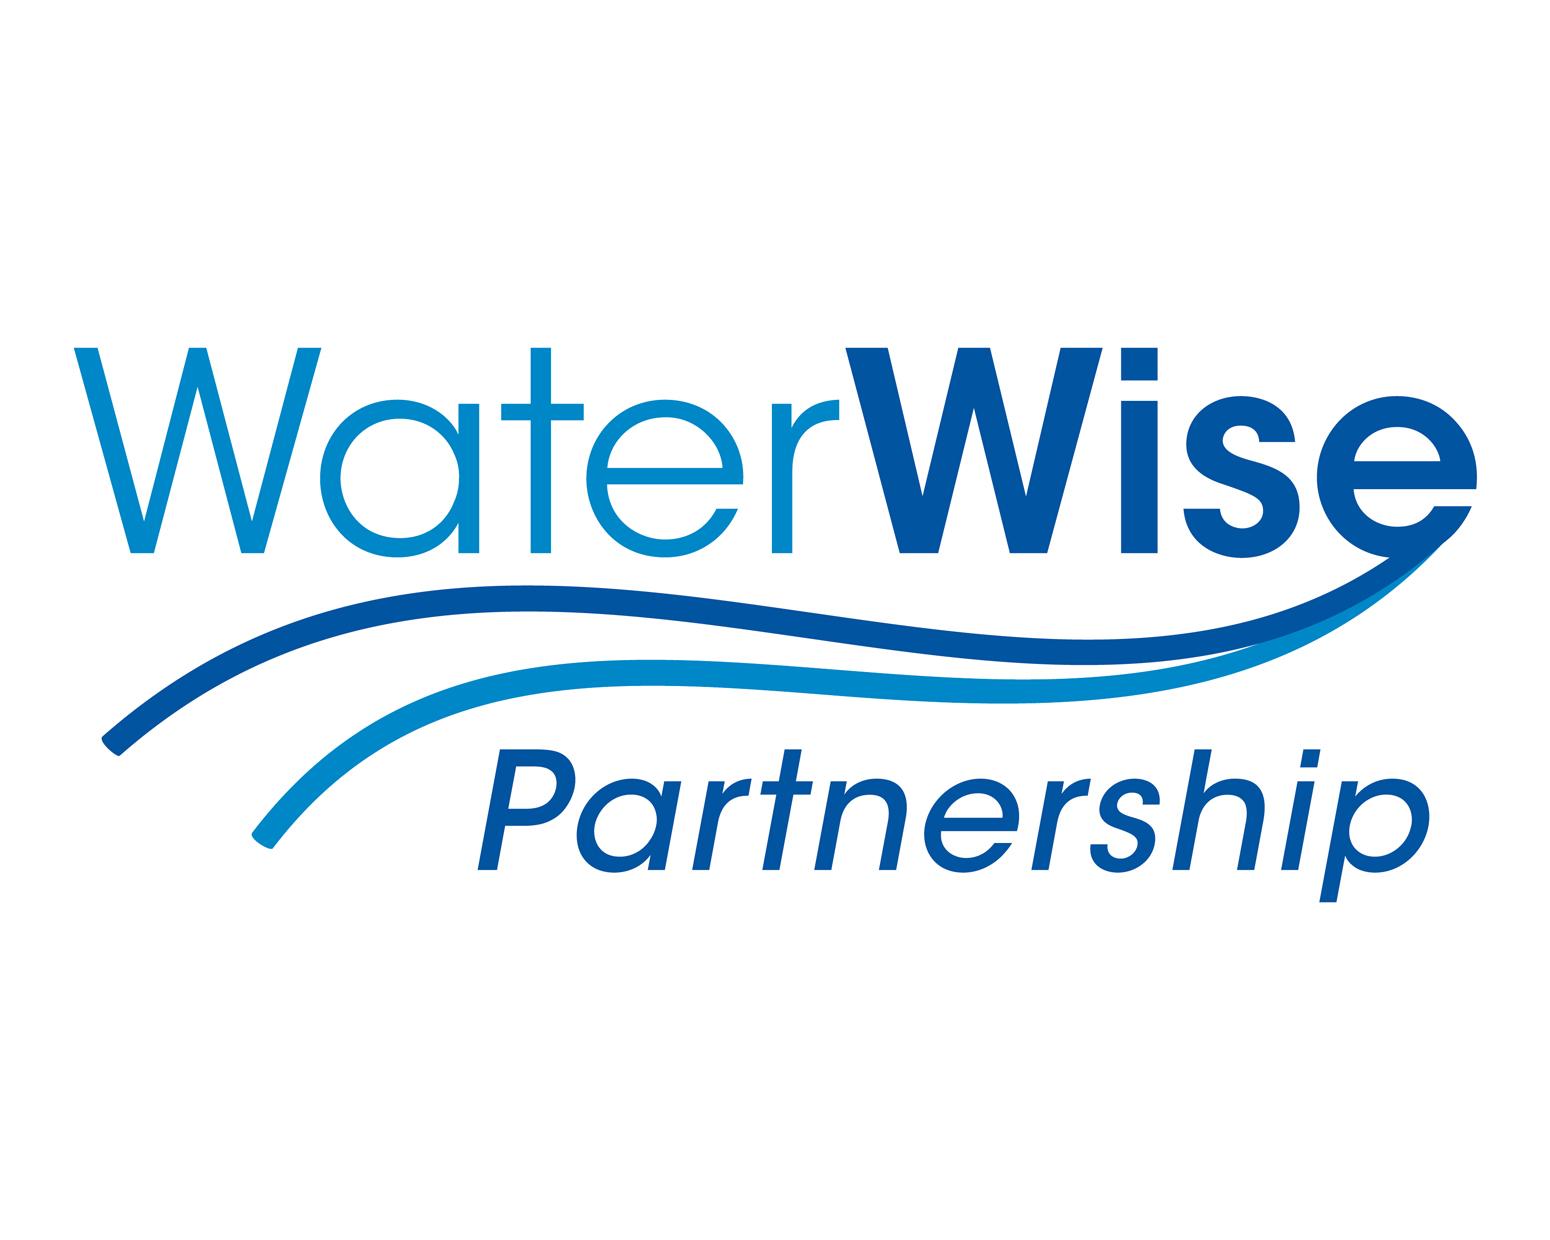 WaterWise Partnership